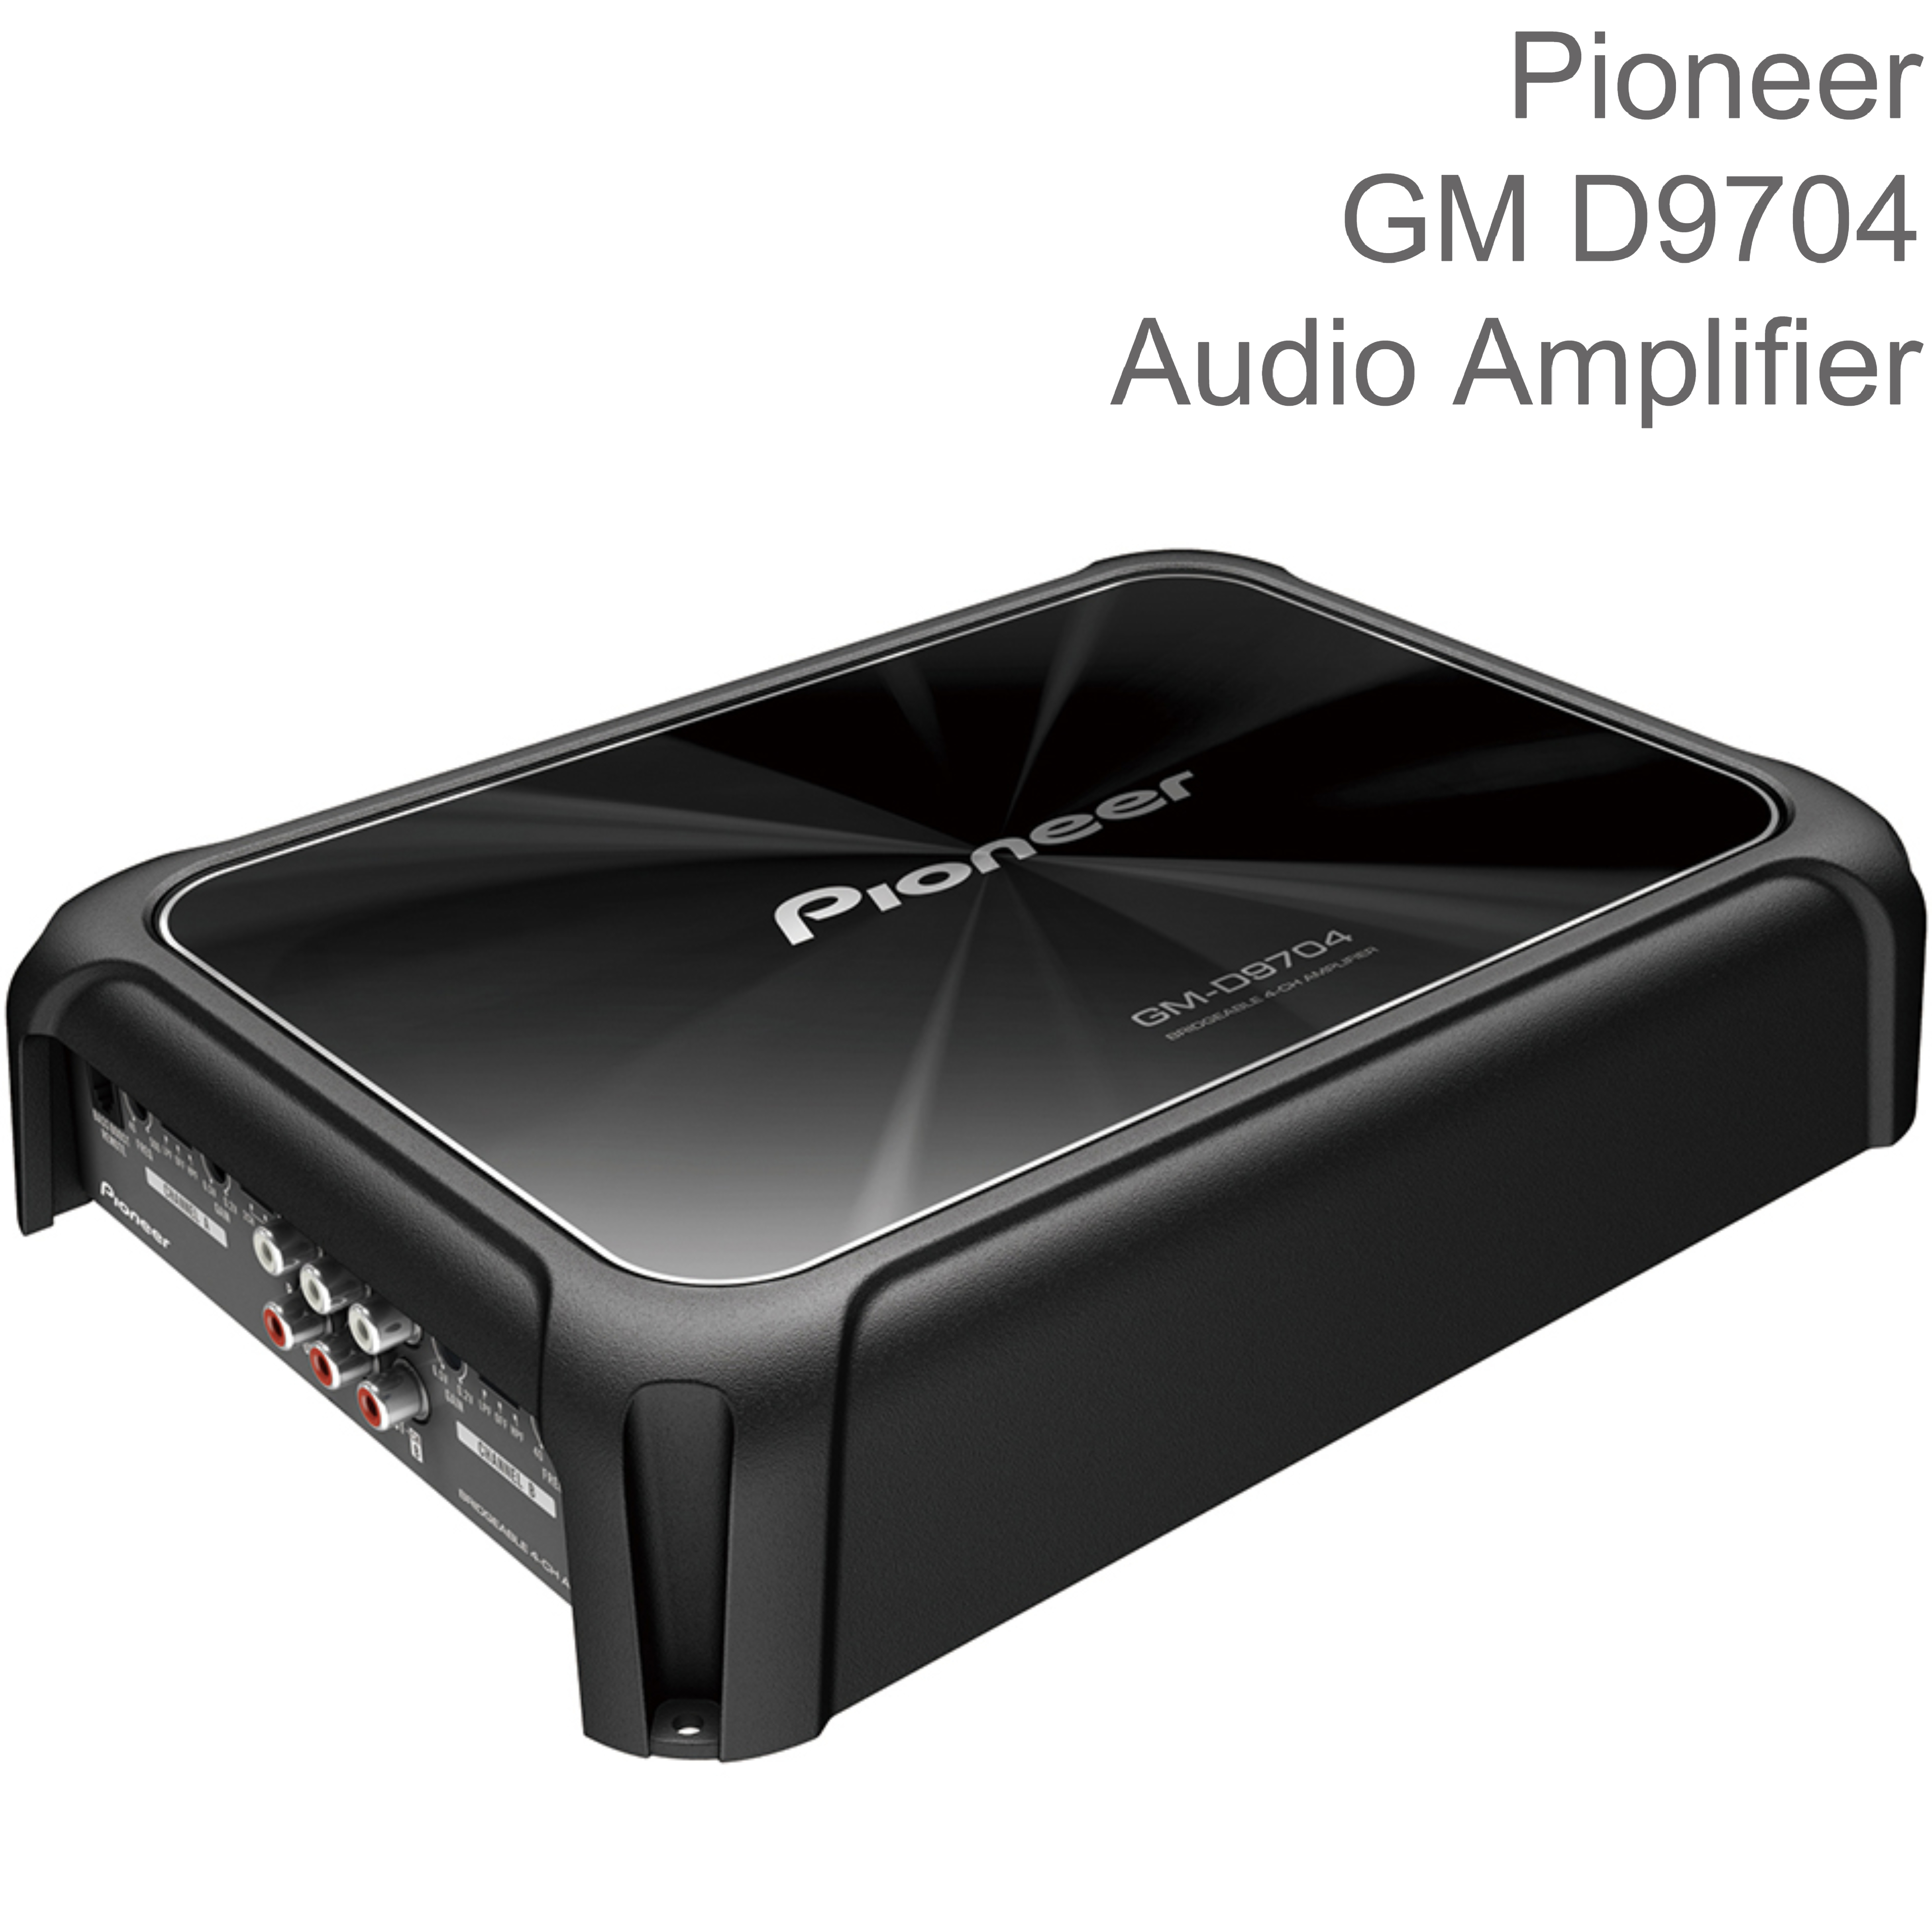 Pioneer 4-Channel Class-D Bridgeable Audio Amplifier with Bass Boost | 1600W Power